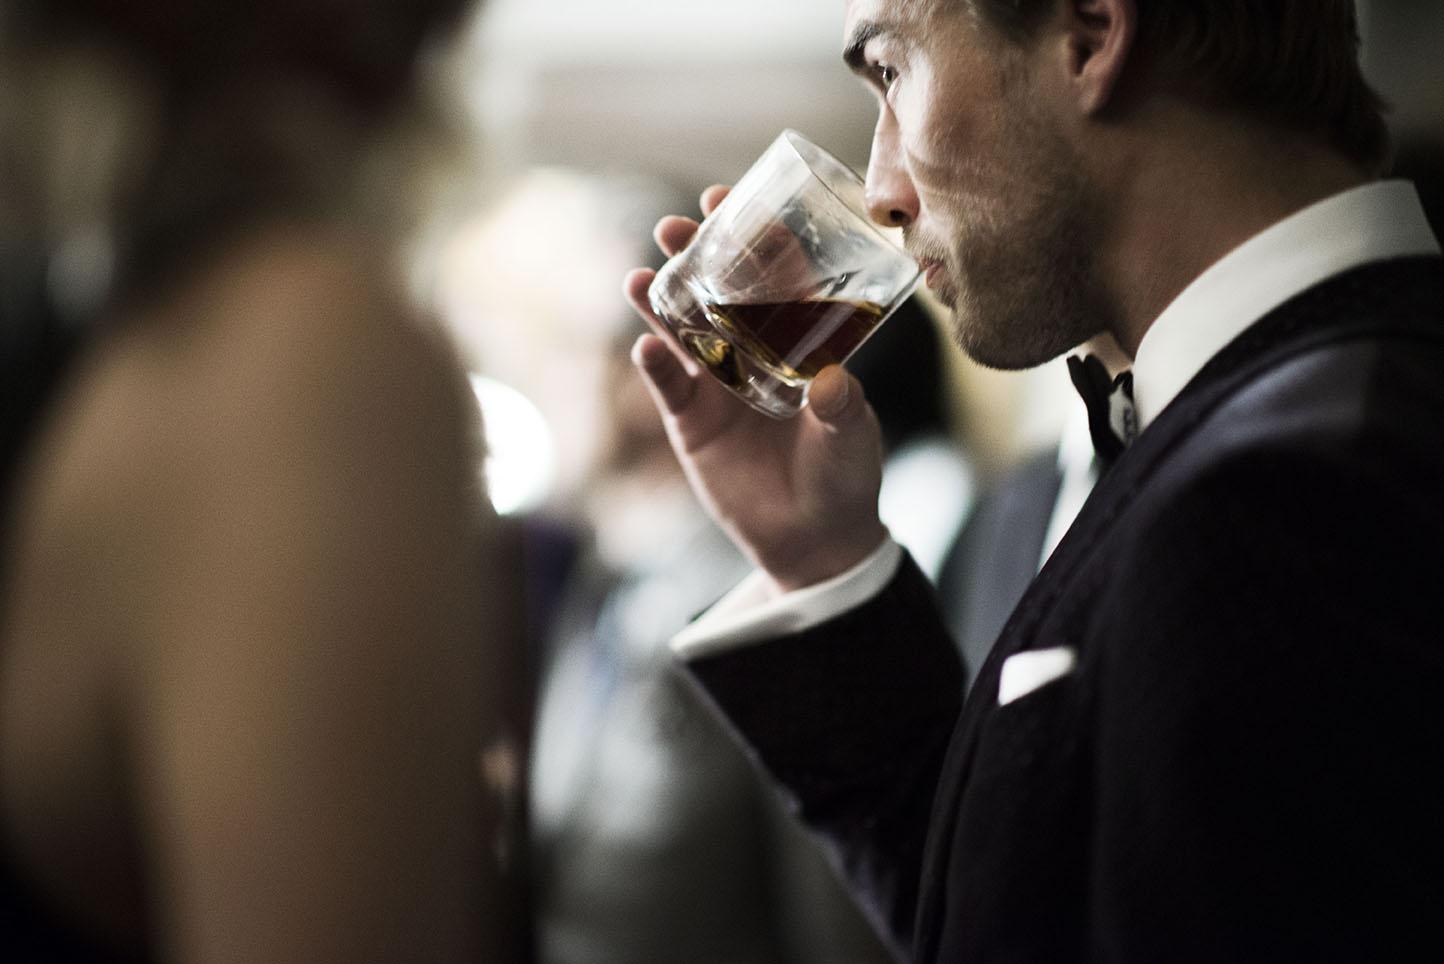 Vinul rosu si erectia – vreo legatura?